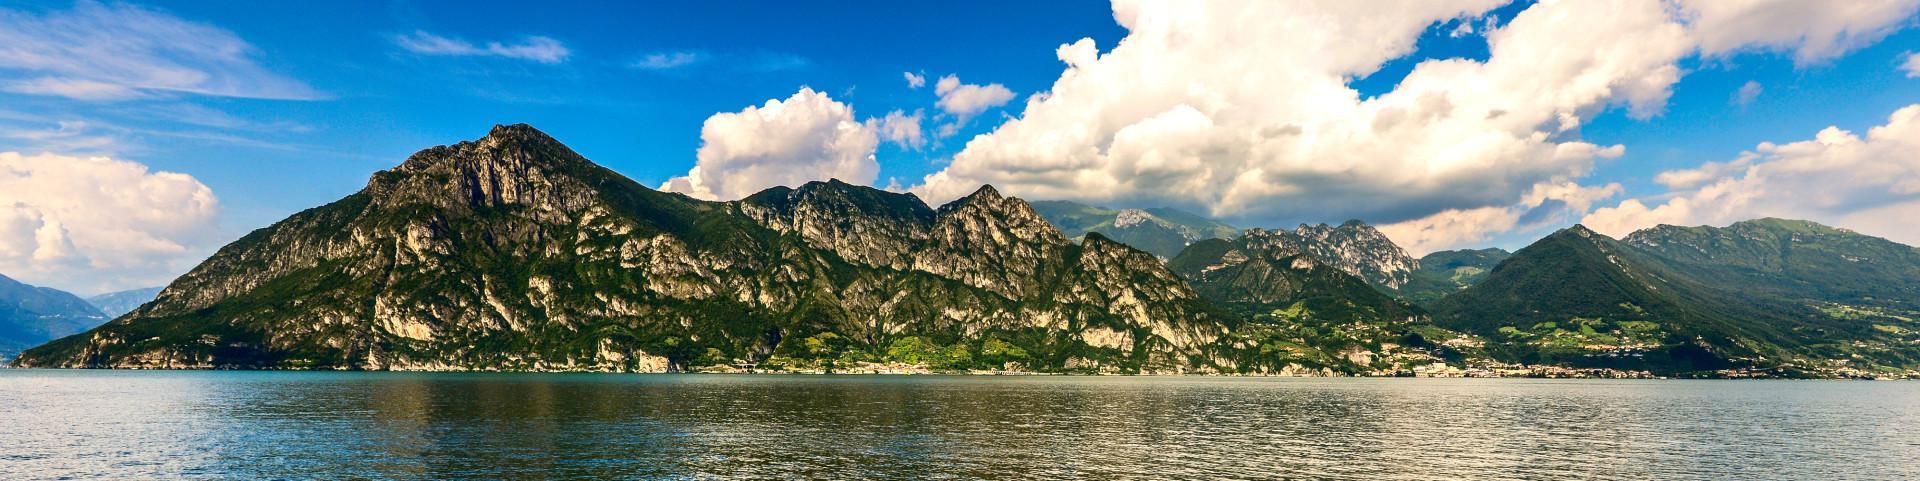 Lago d'Iseo, pohled na pohoří Trentapassi